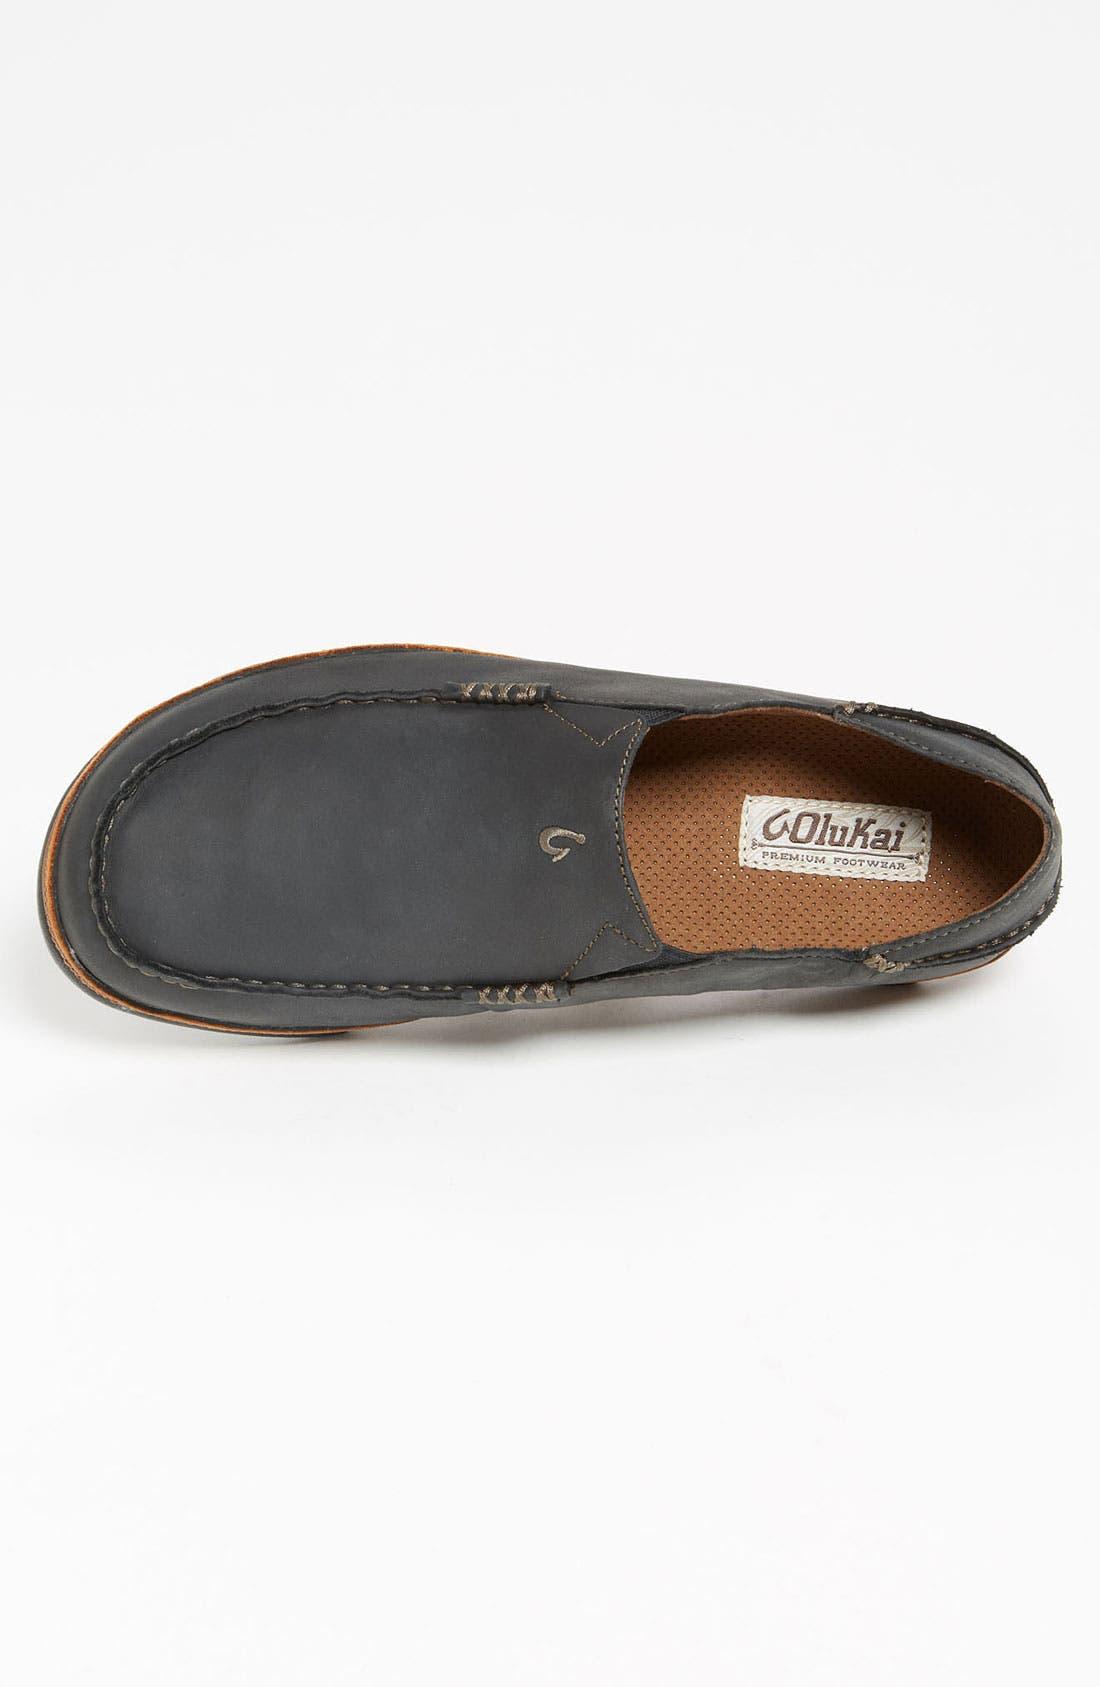 'Moloa' Slip-On,                             Alternate thumbnail 3, color,                             Black/ Toffee Leather